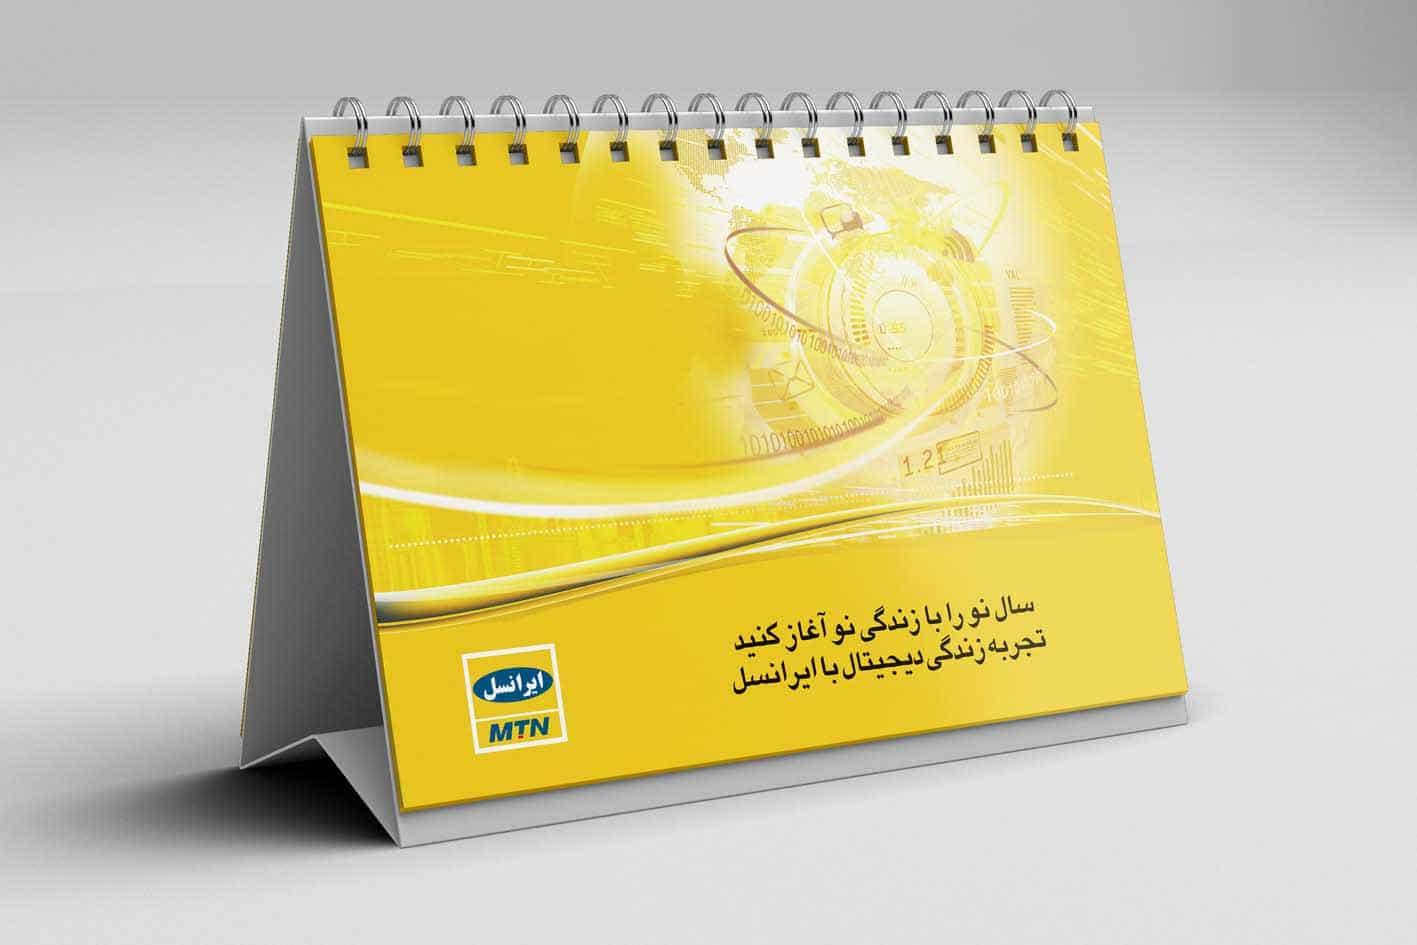 تقویم رومیزی ایرانسل